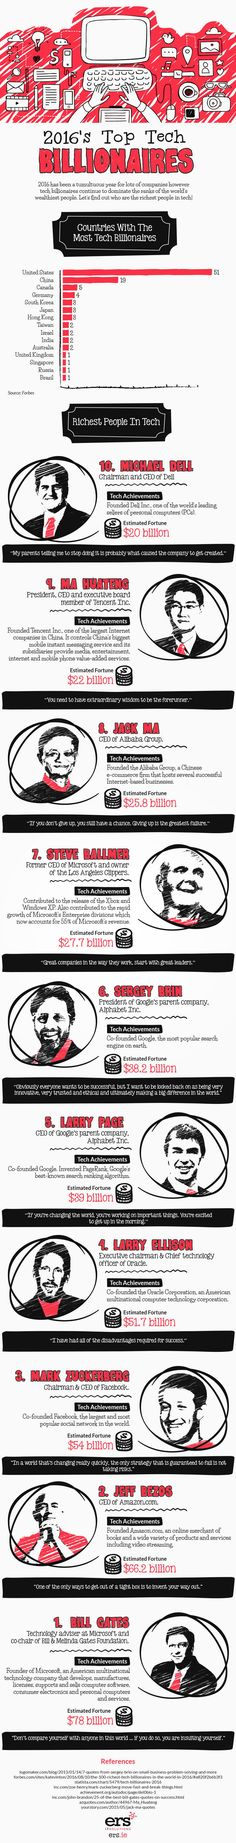 Top 10 Tech Billionaires Of 2016 - Infographic